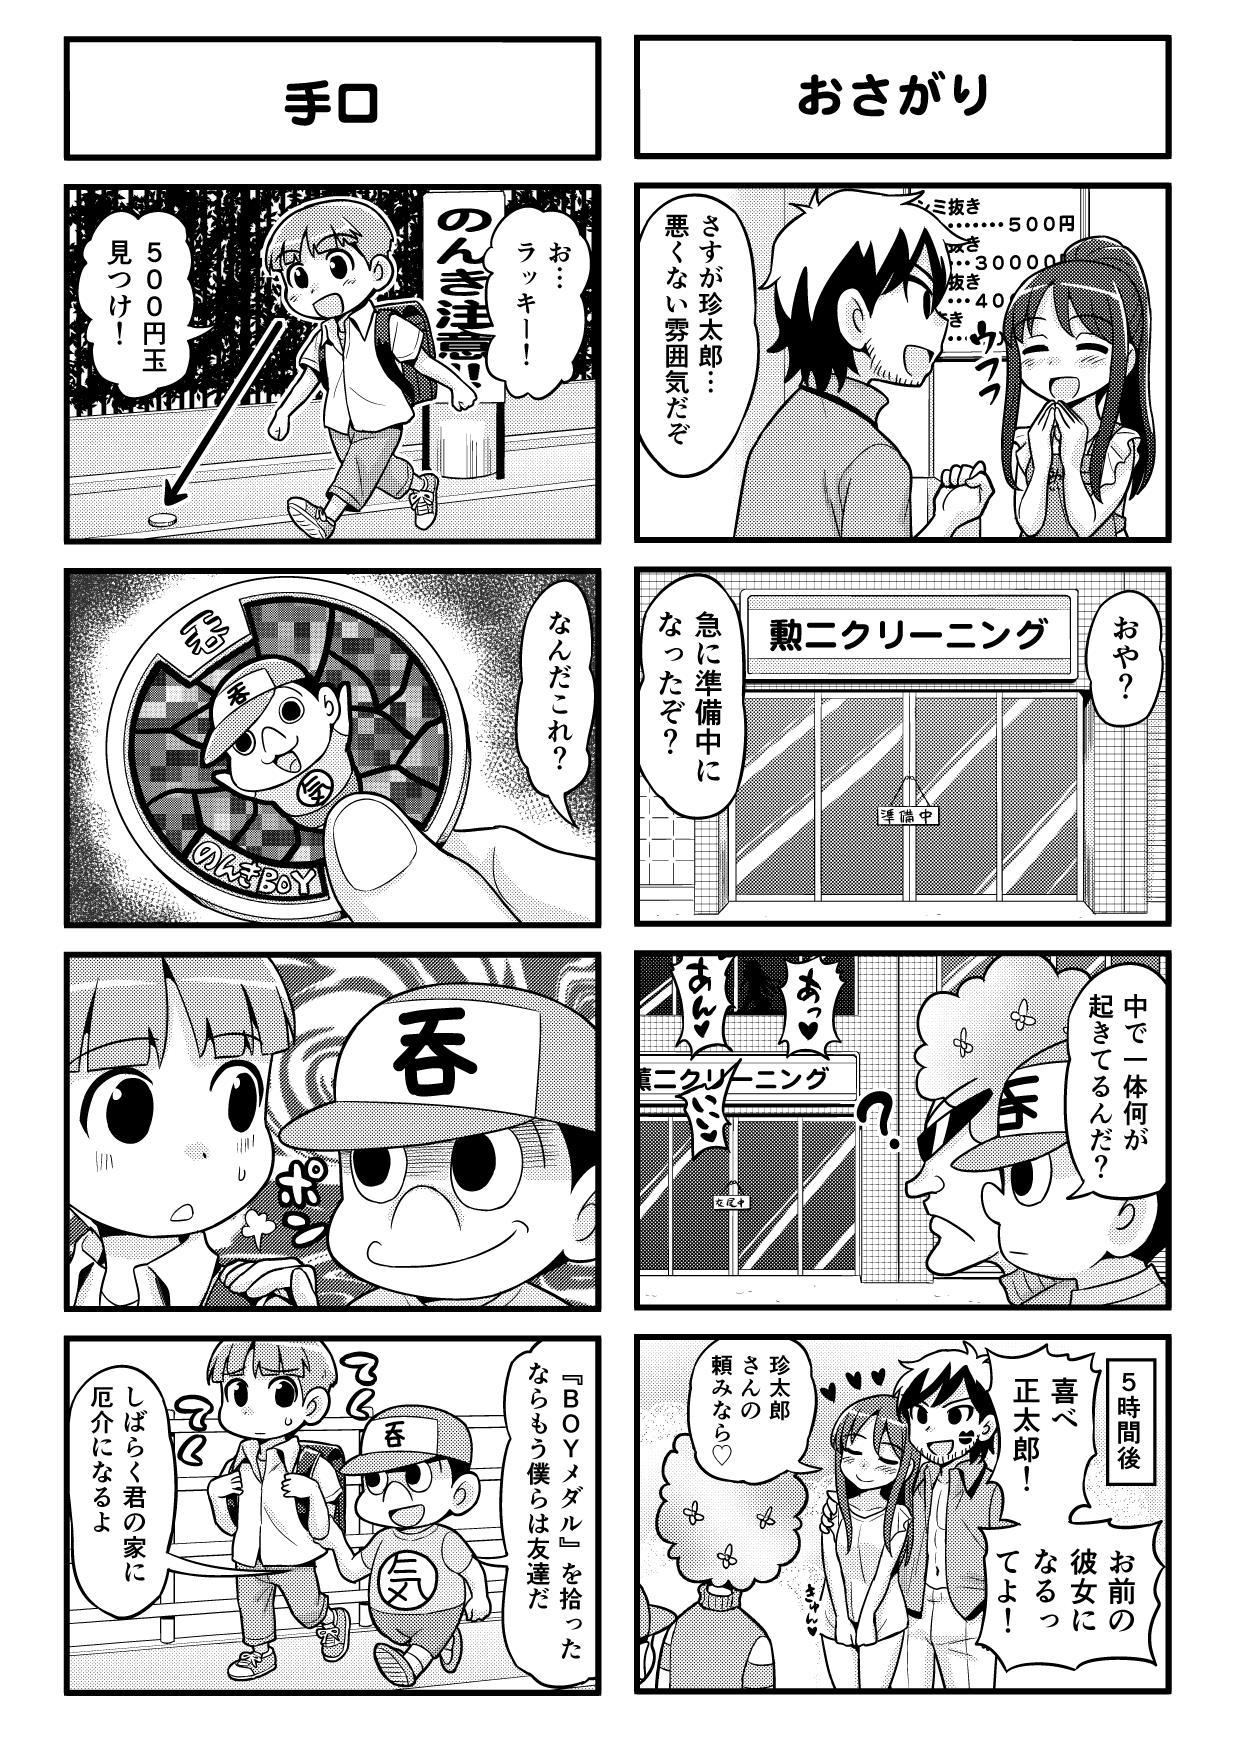 Nonki BOY Ch. 1-23 67